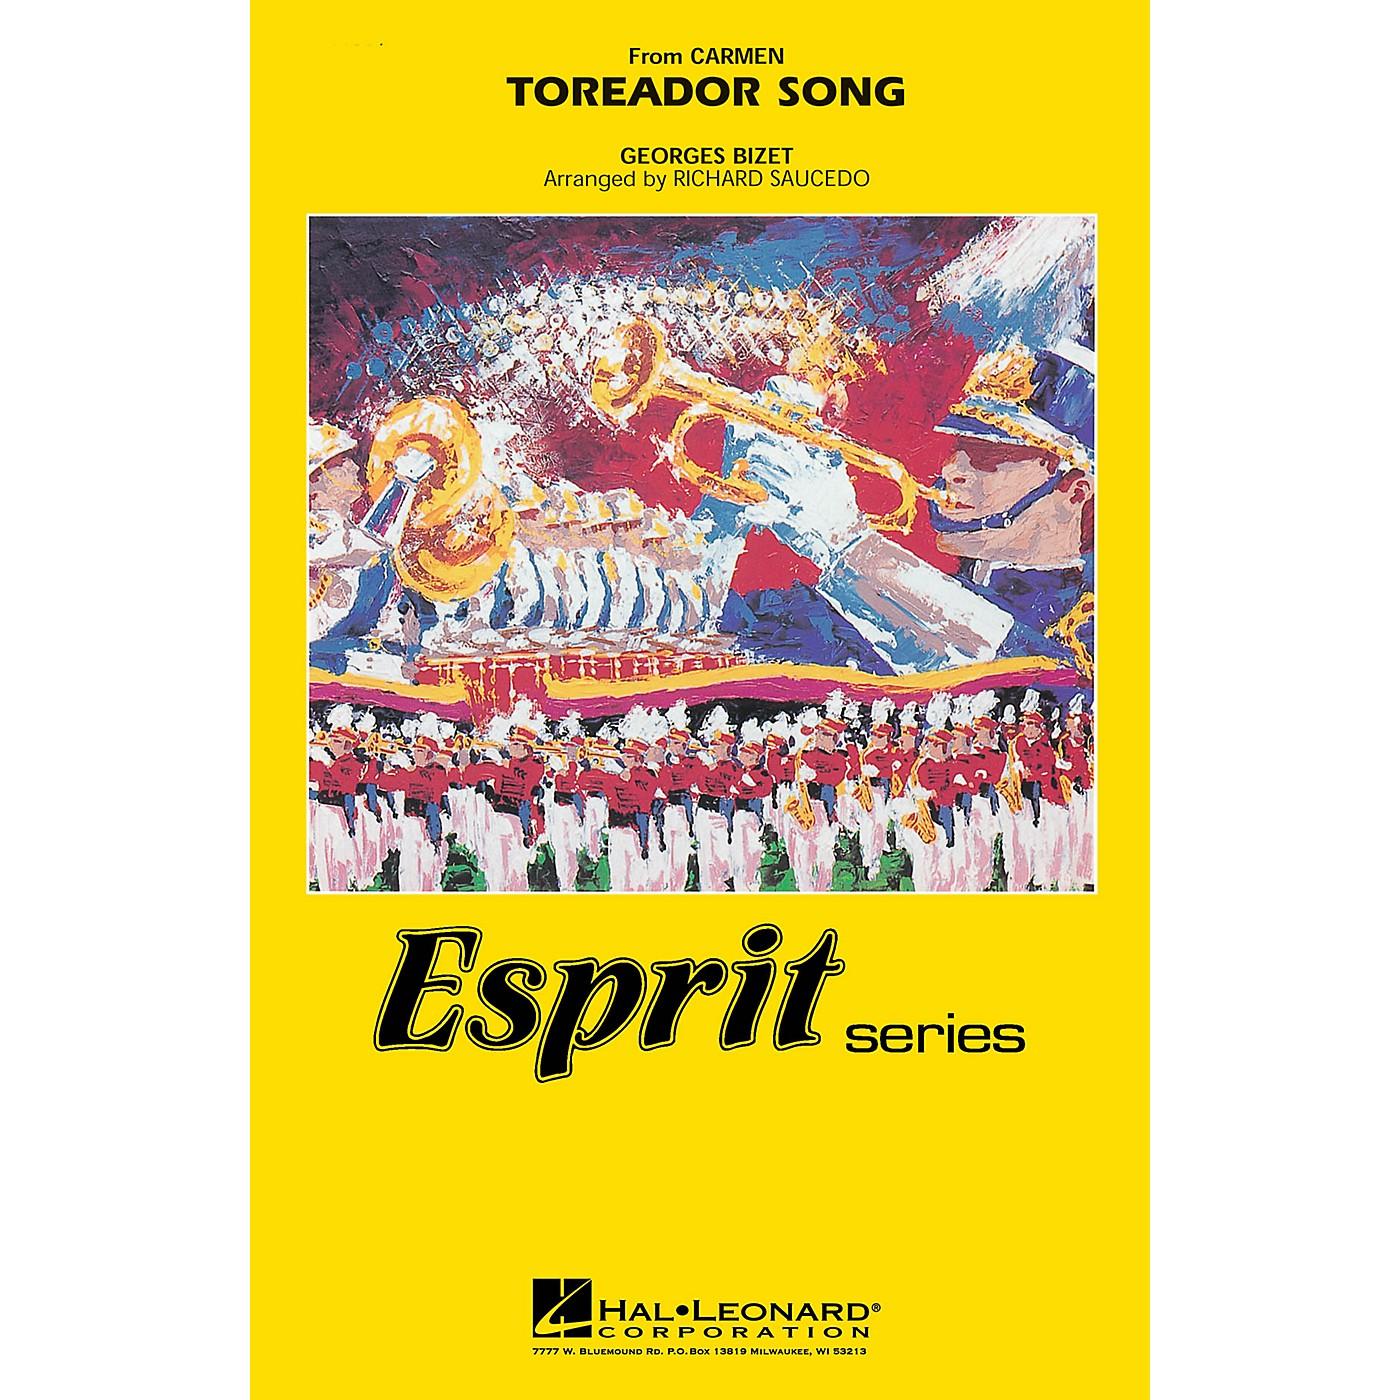 Hal Leonard Toreador Song (from Carmen) Marching Band Level 3 Arranged by Richard Saucedo thumbnail